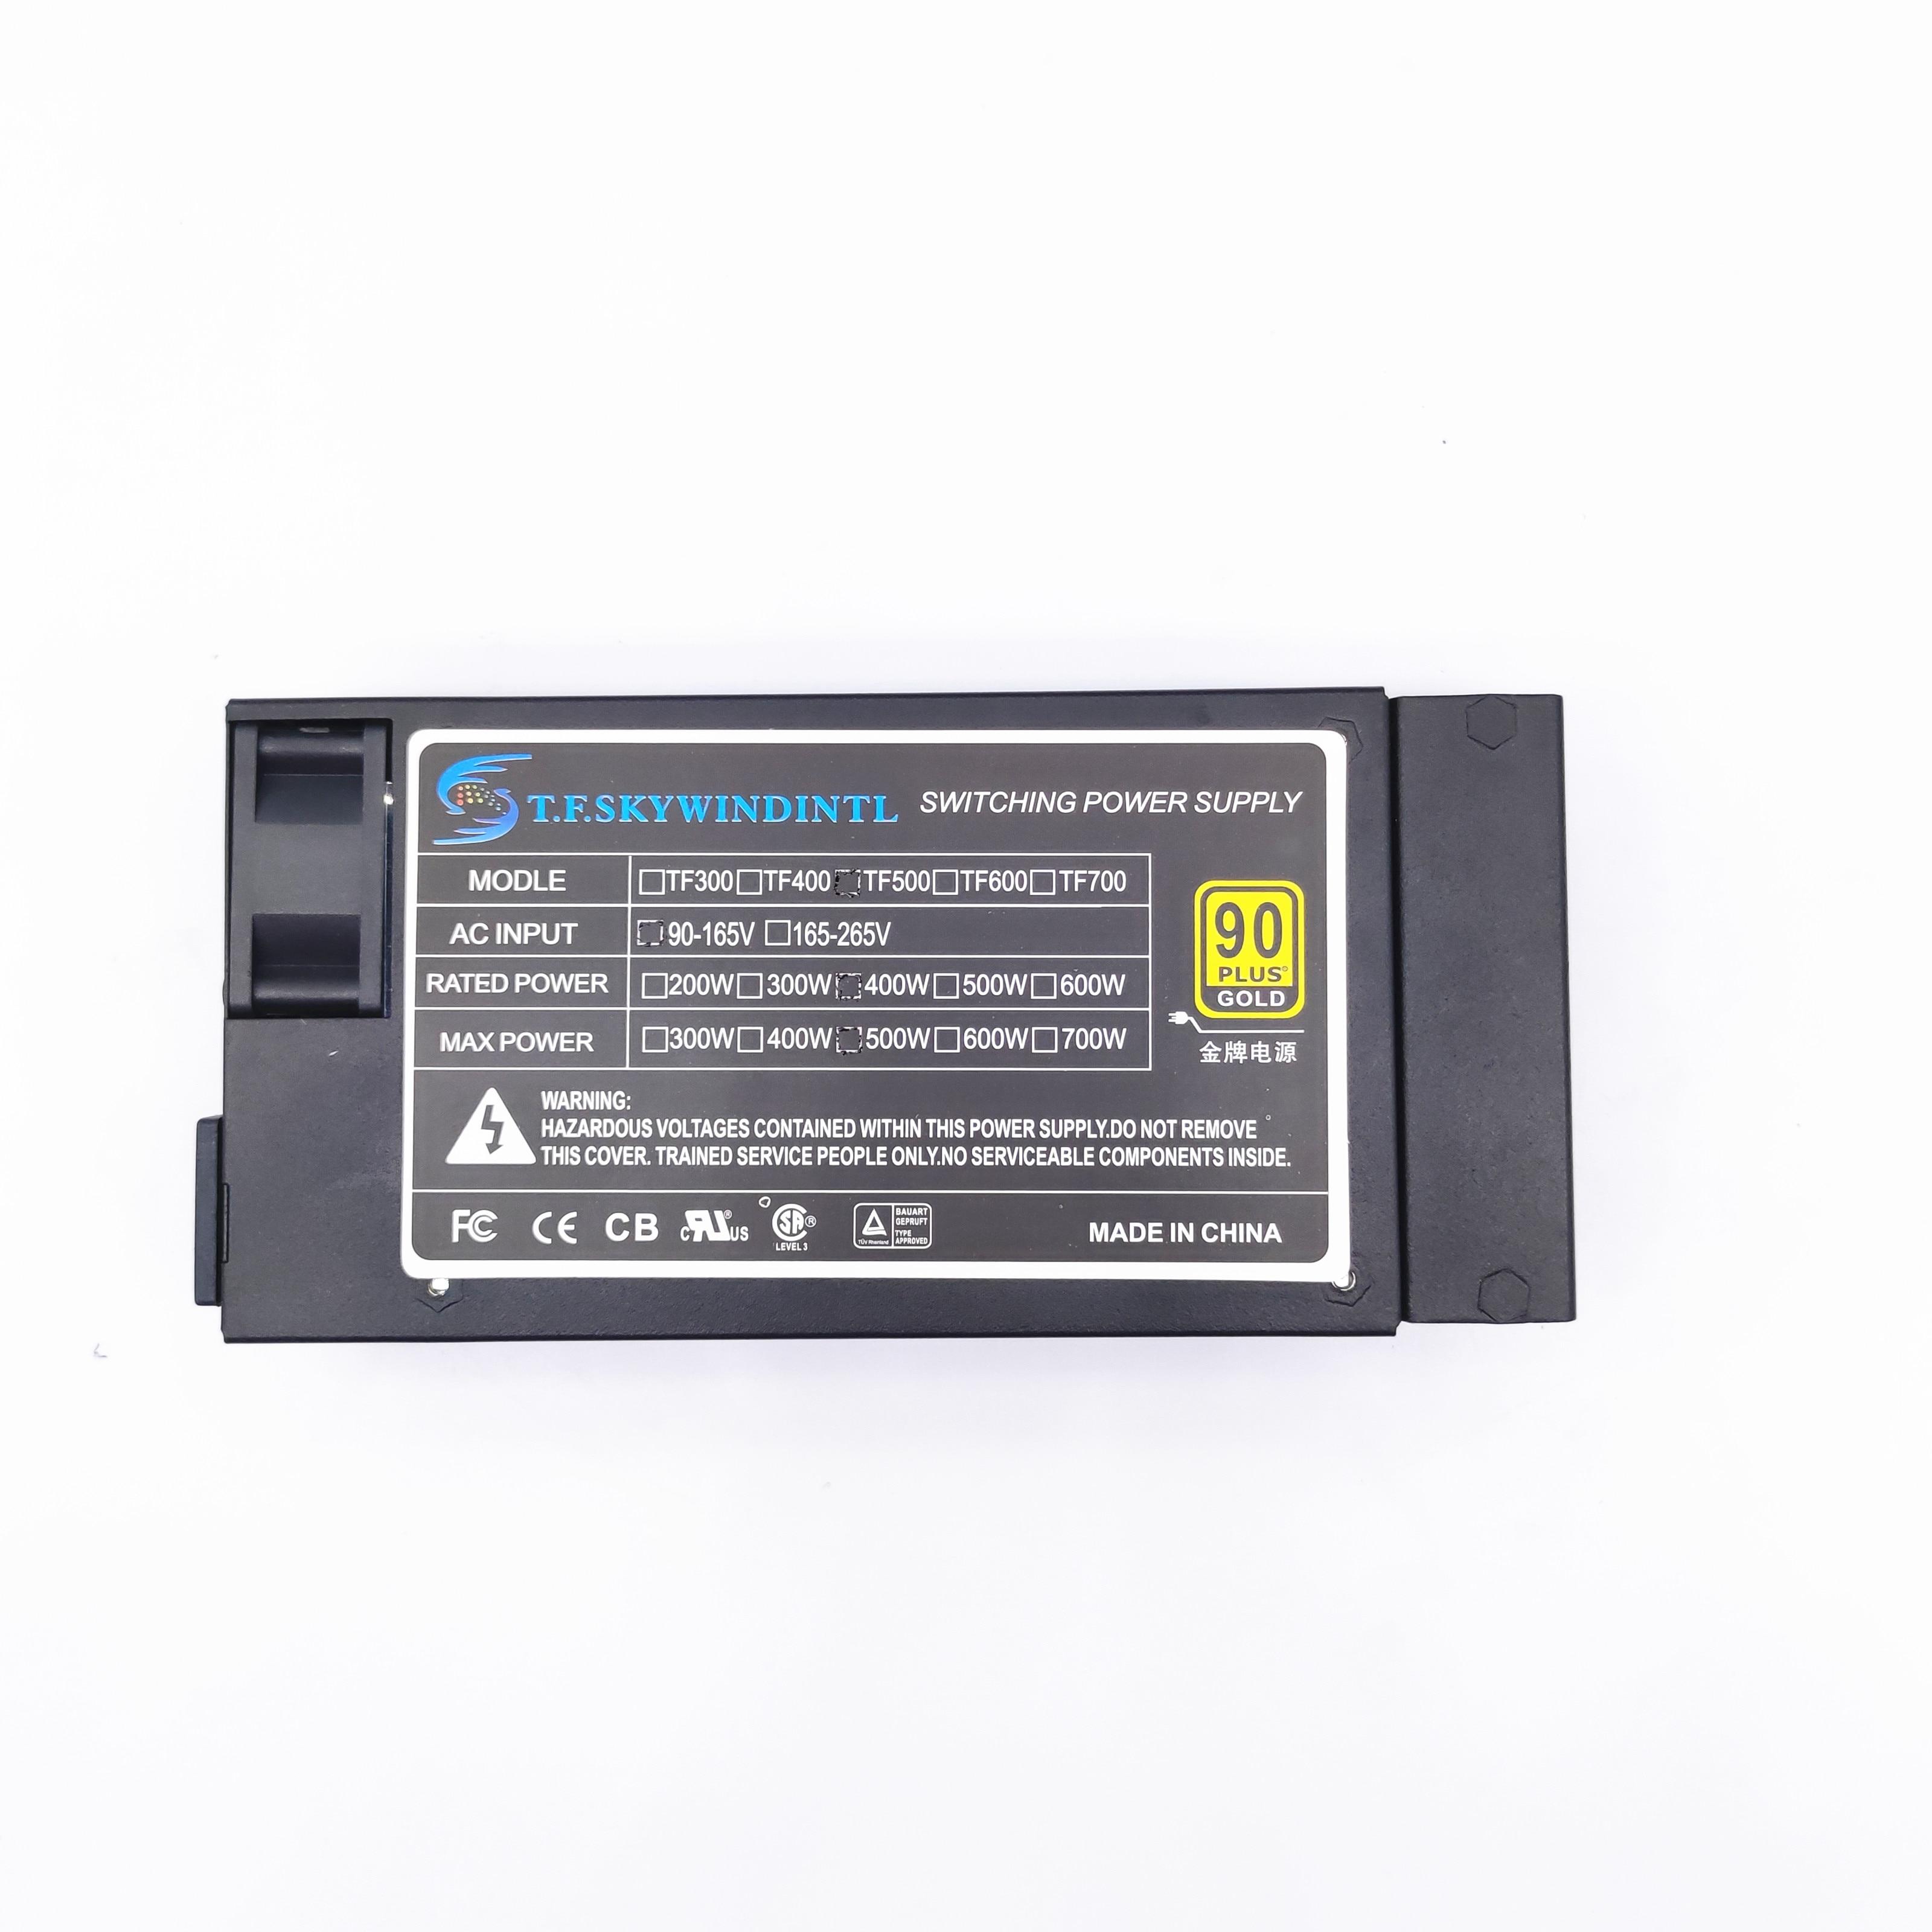 Flex 400W PSU Active PFC 400W ATX Flex Full Modular Power Supply for POS AIO system Small 1U (Flex ITX) Computer Power Supply new psu for xinhang flex itx k39 k35 s3 e200 small 1u rated 350w peak 400w power supply xh 3501psu fsp270 60le fsp250 50gub